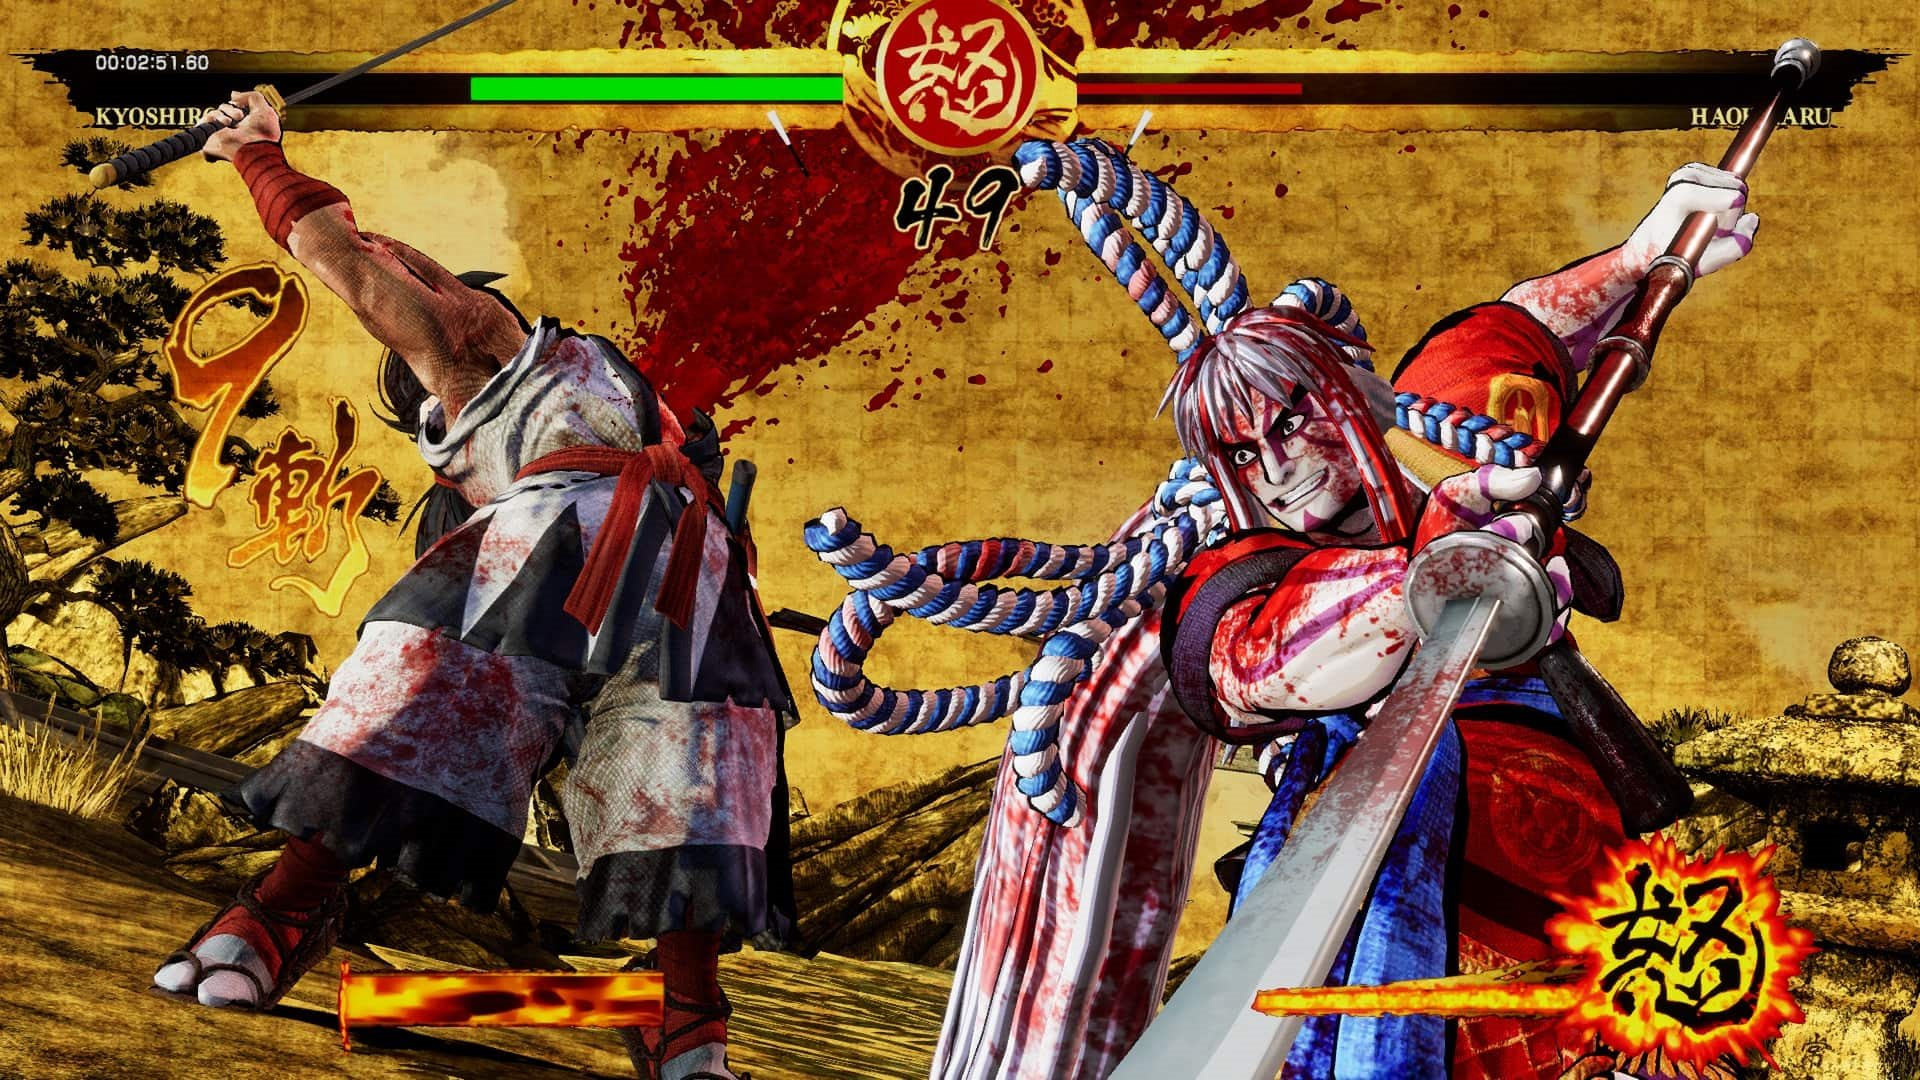 Samurai Shodown; gameplay: gašpar